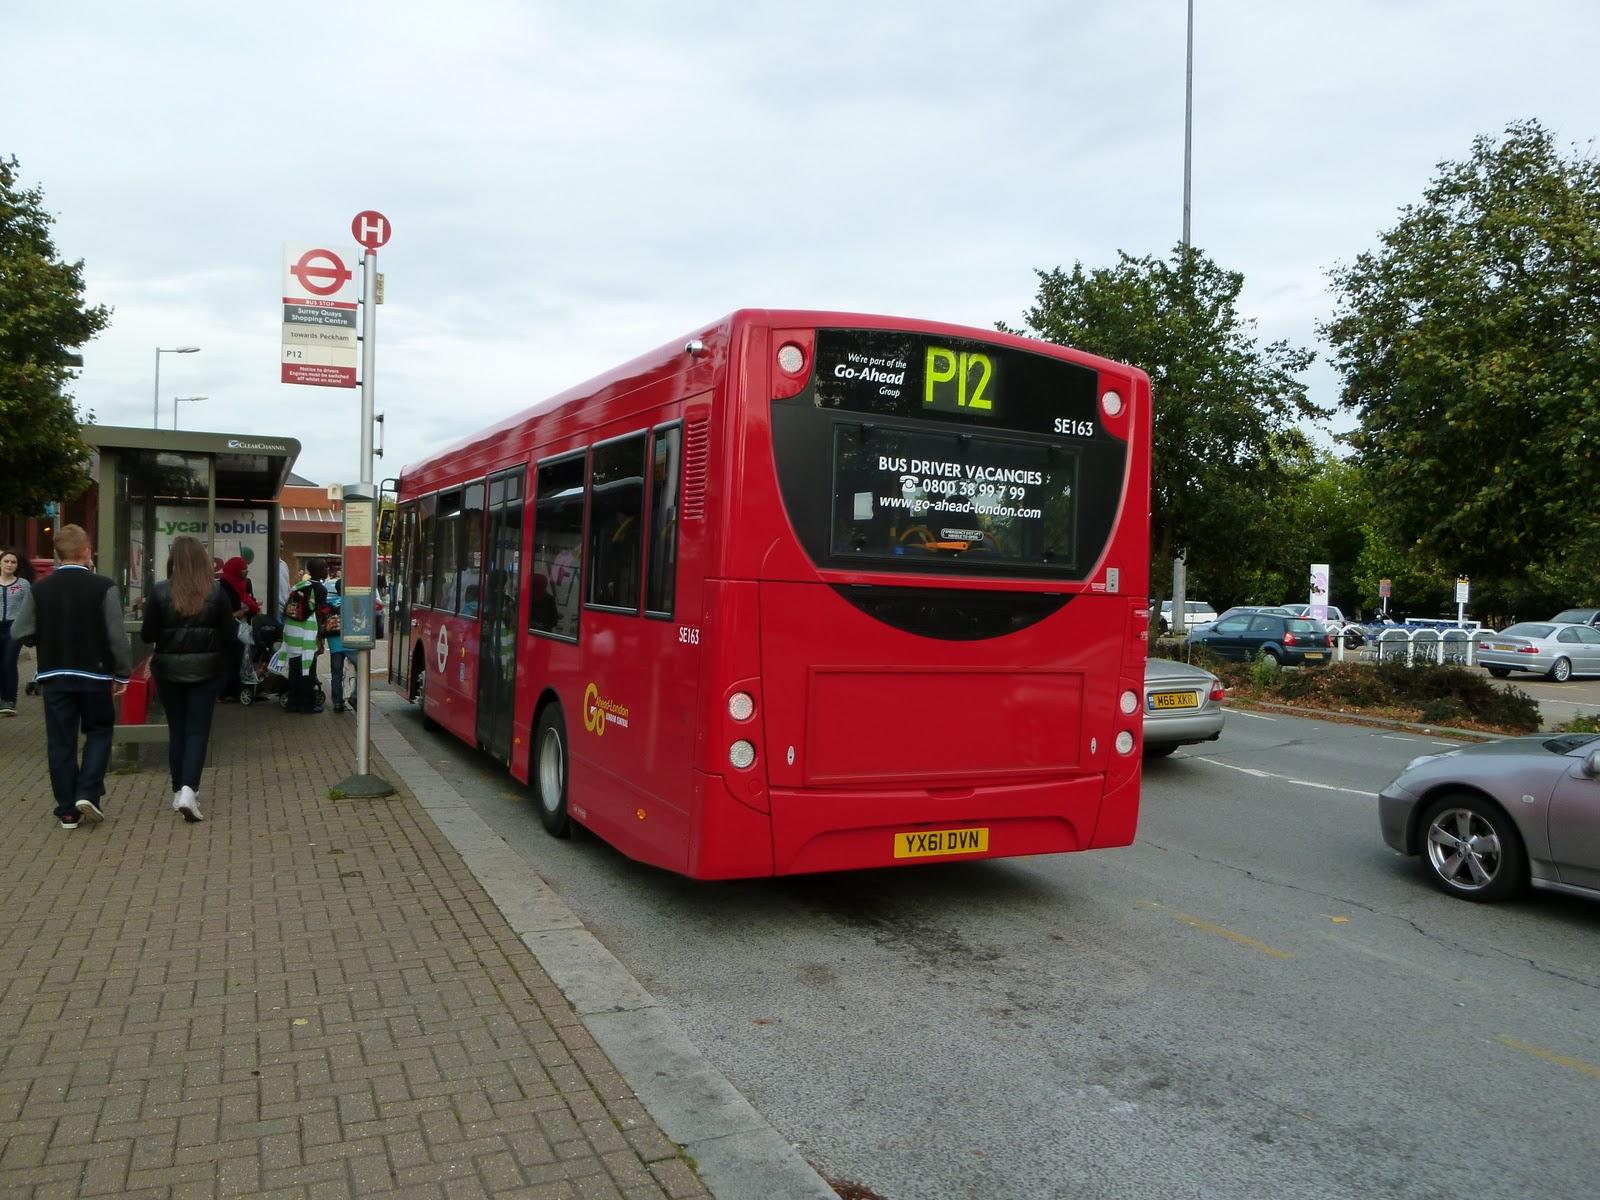 tom london & surrey bus blog: route p12 observations